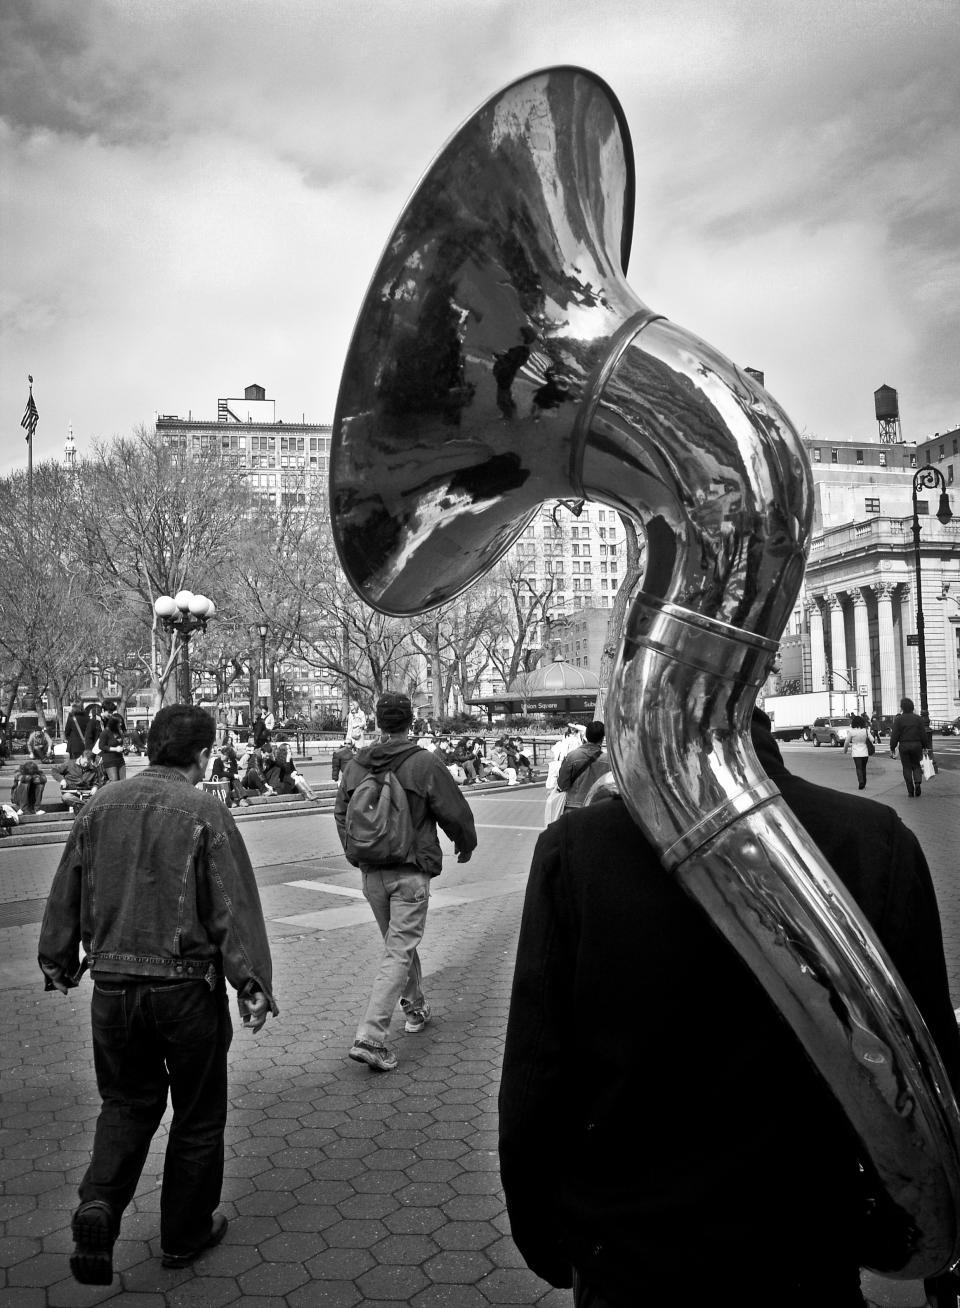 walking tuba pedestrians music lampposts instrument horn cobblestone buildlings band backpack